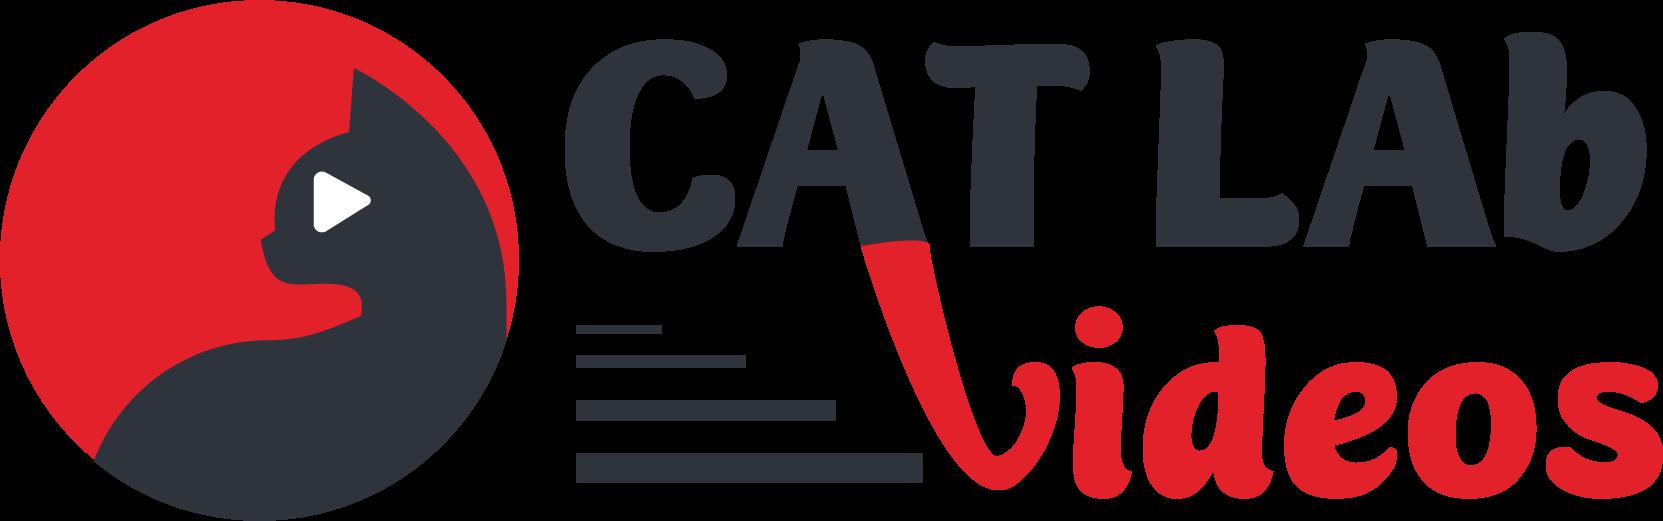 Catlab Videos